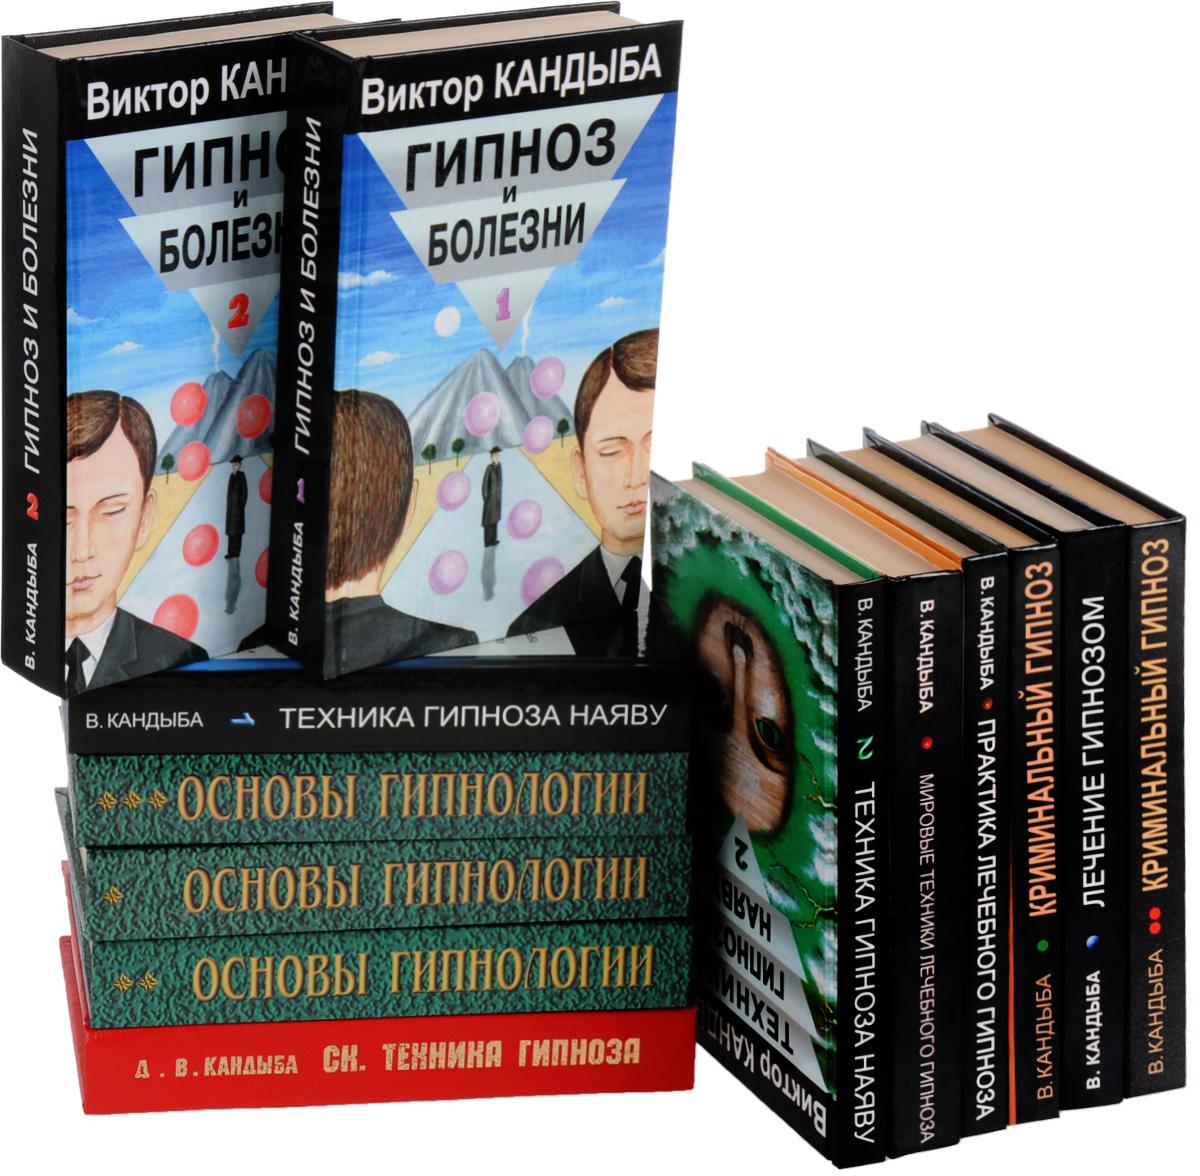 Виктор Кандыба, Д. В. Кандыба Гипноз. Теория и практика. Книги Виктора Кандыбы (комплект из 13 книг)